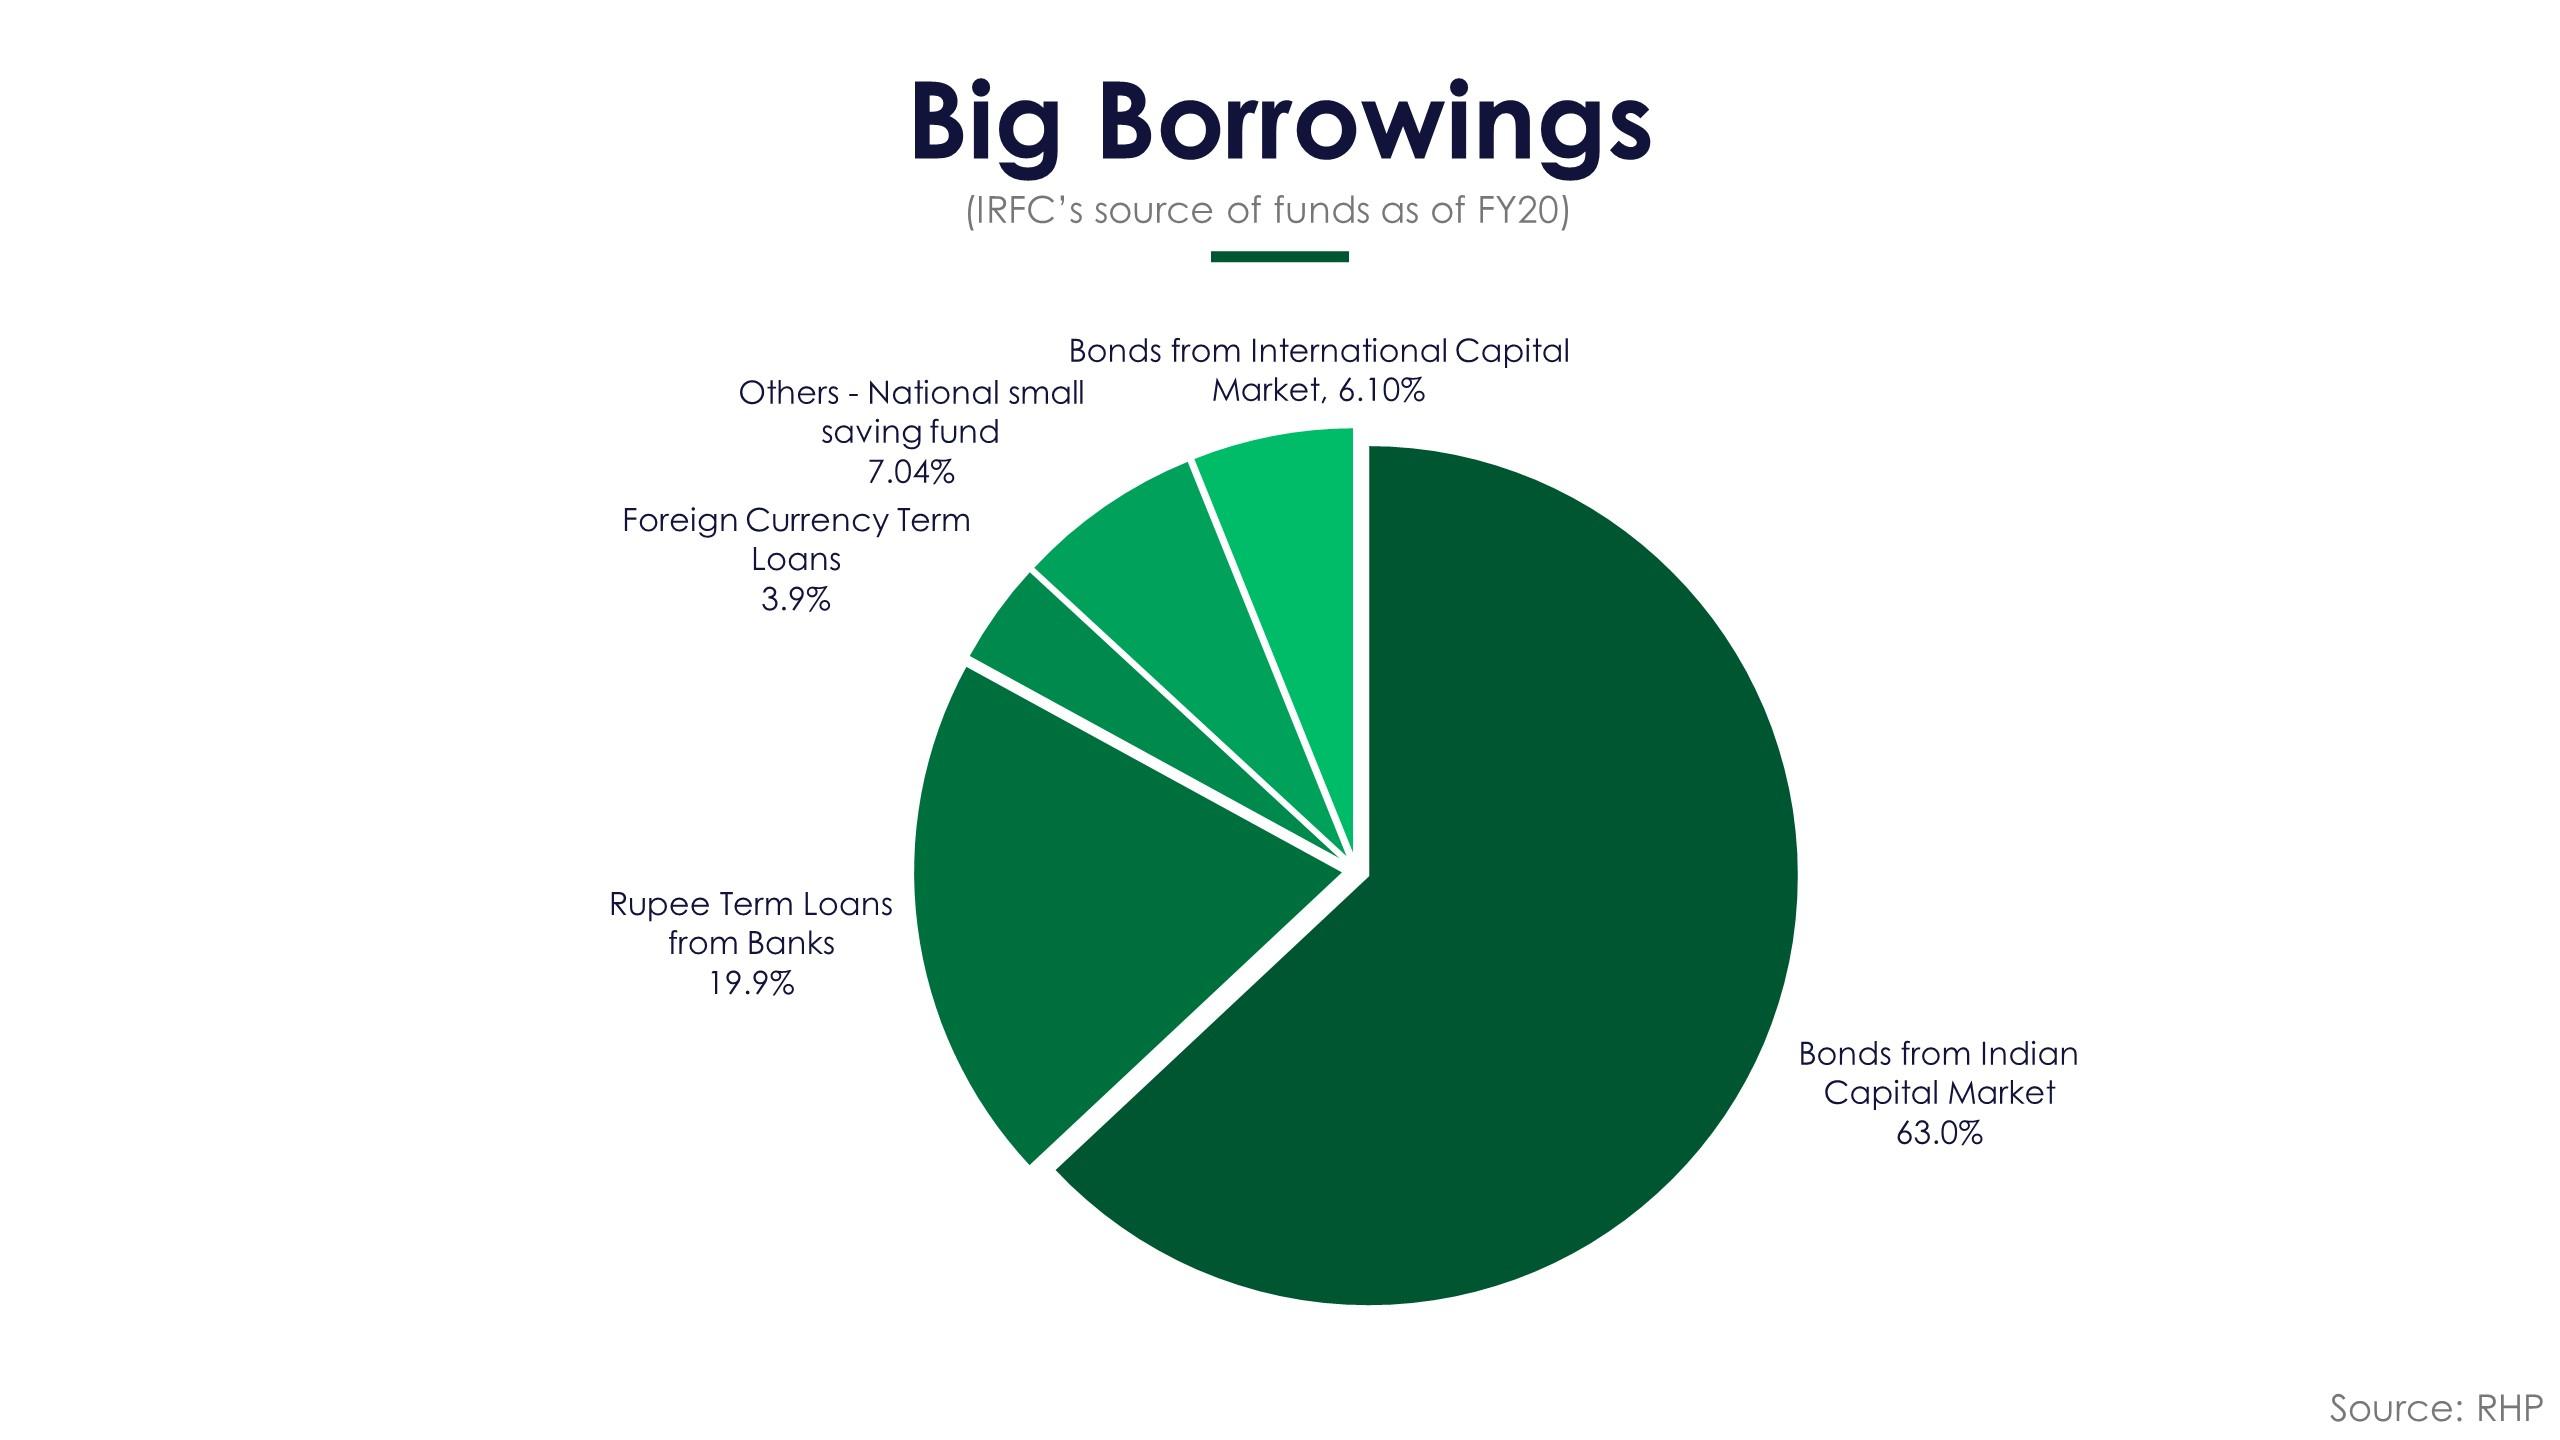 IRFC Borrowings